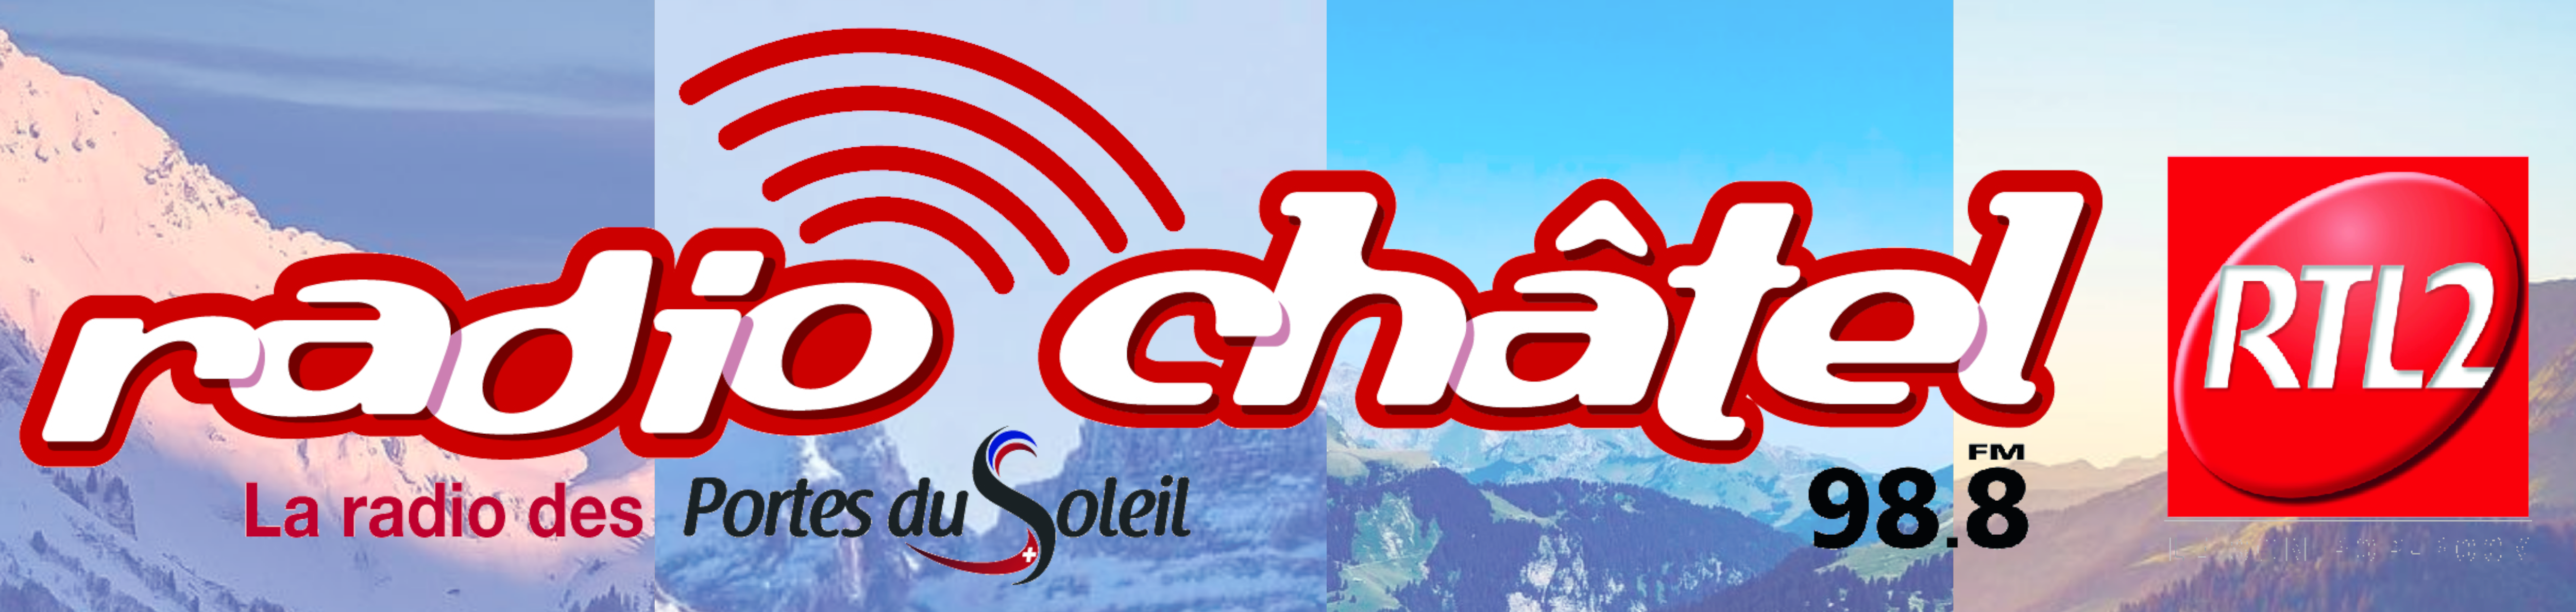 Radio Châtel